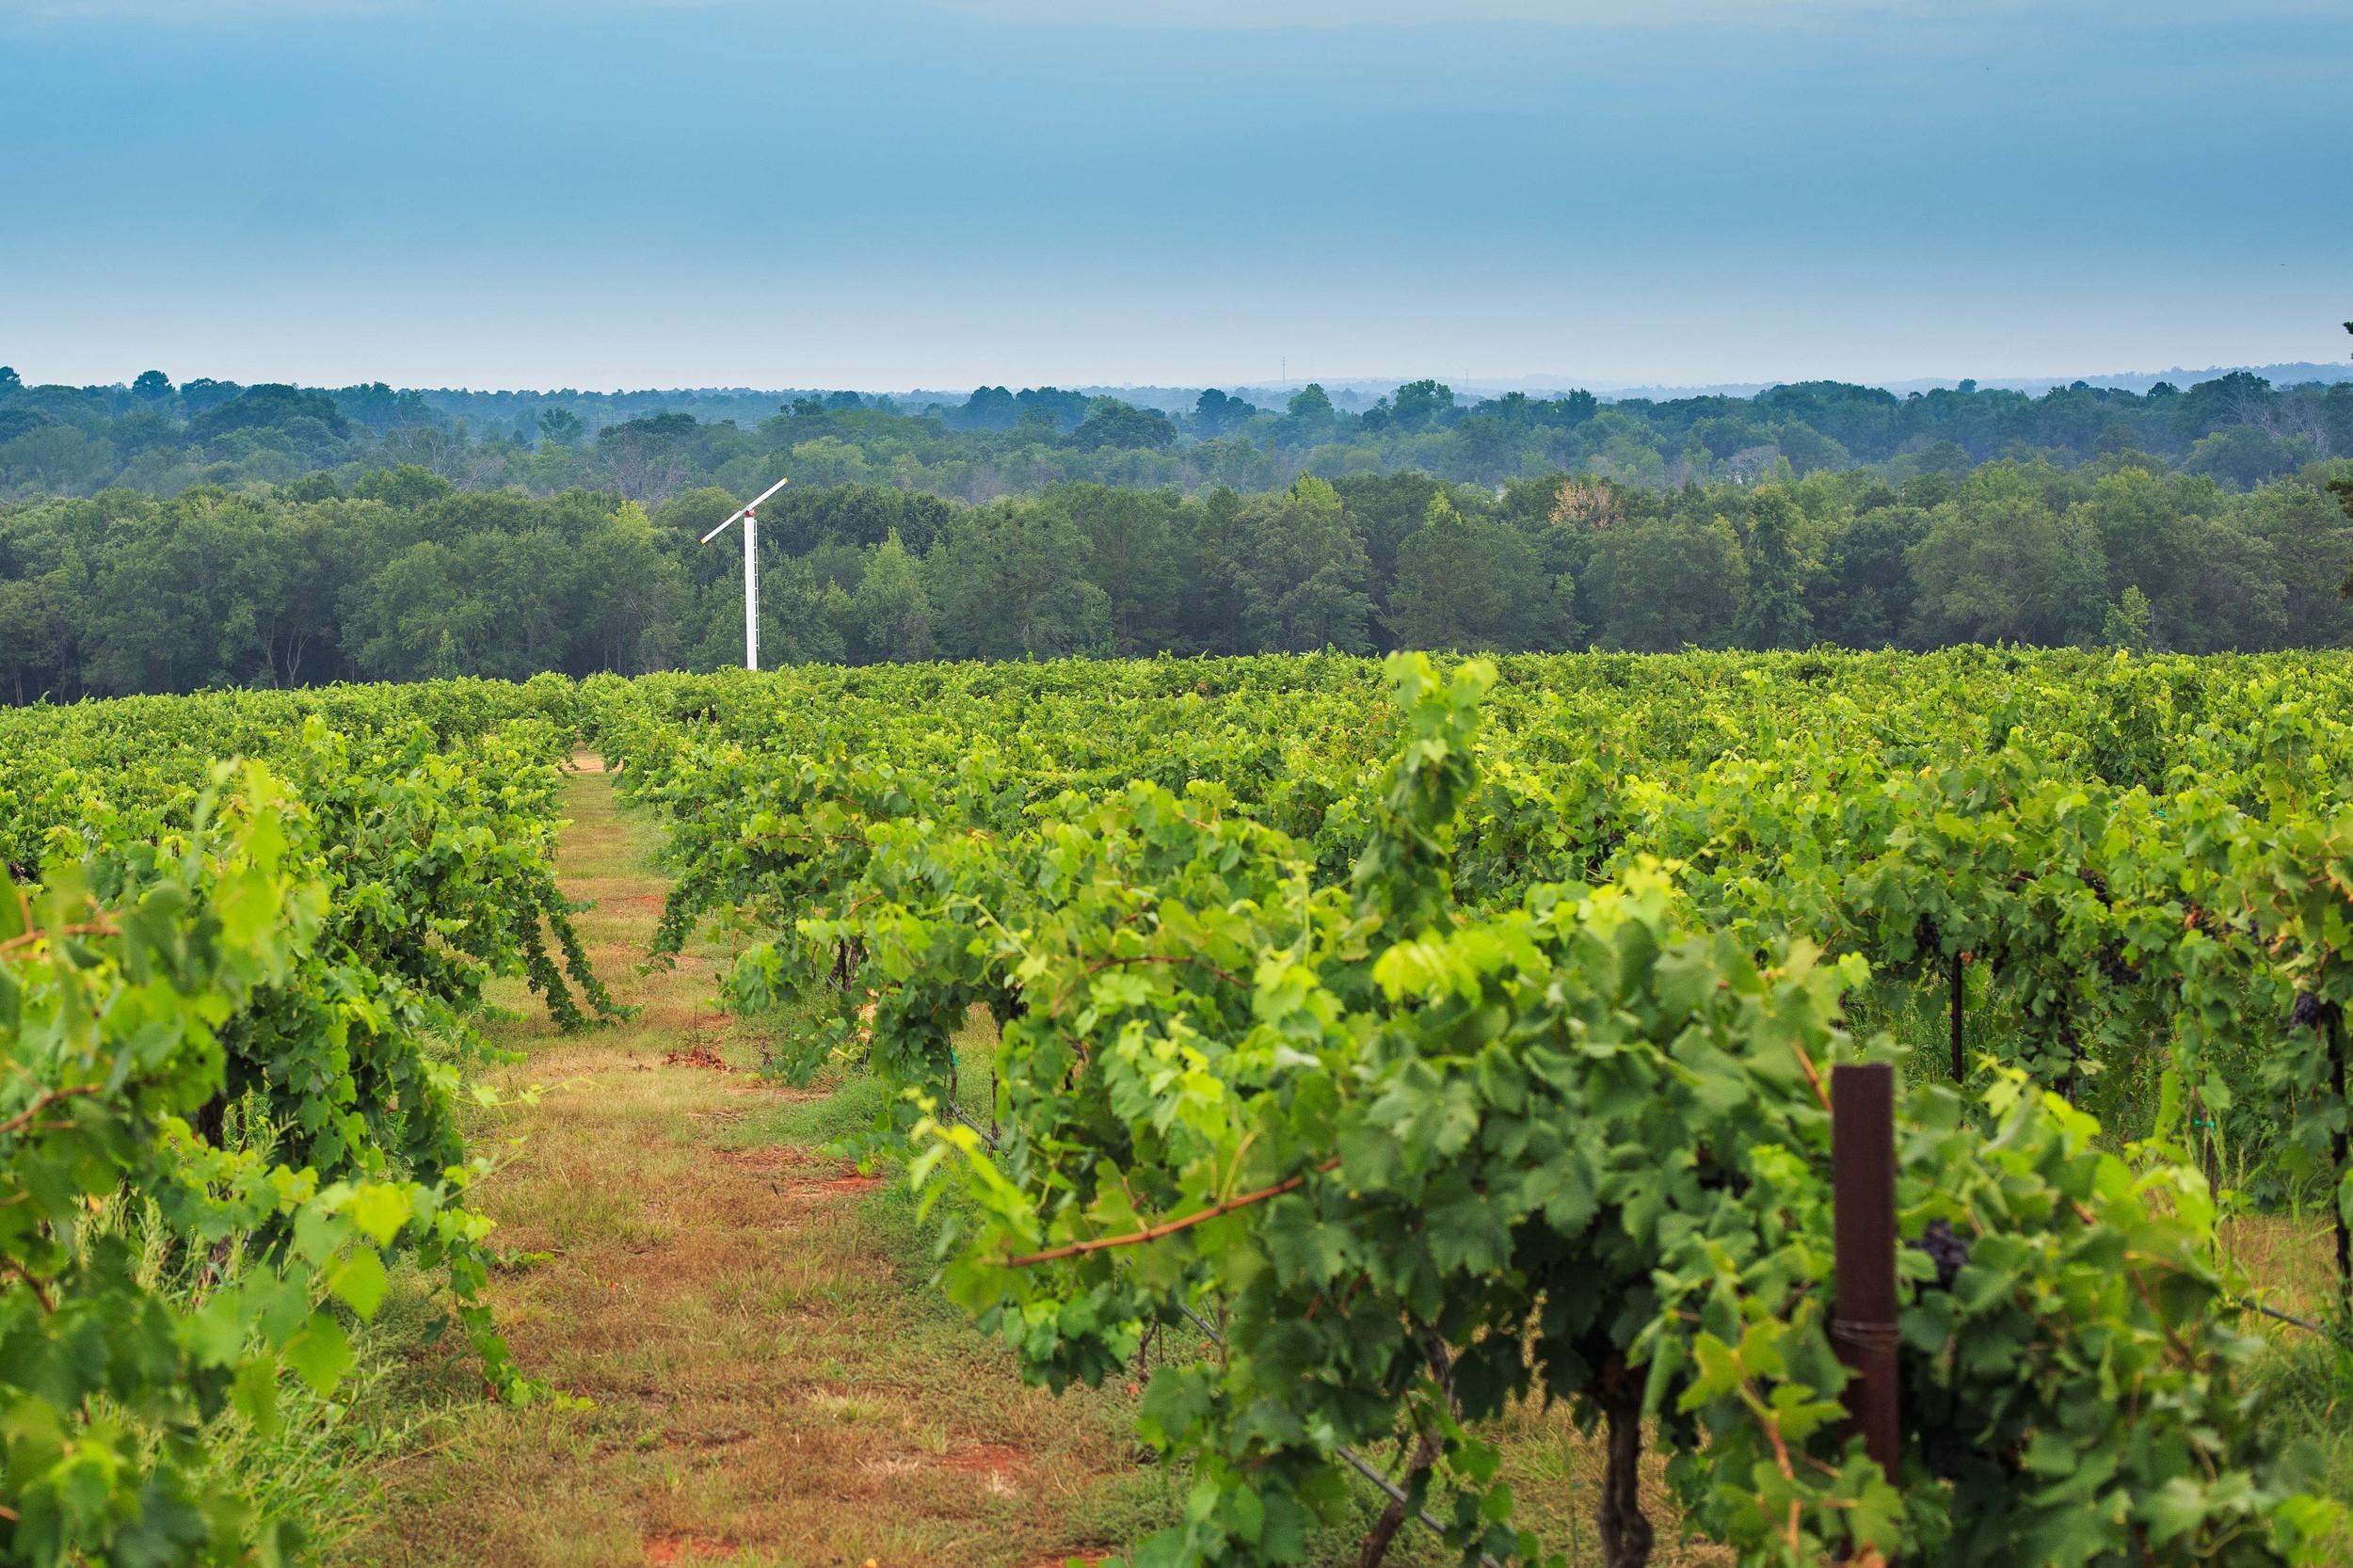 Vineyard with View of Wind Machine